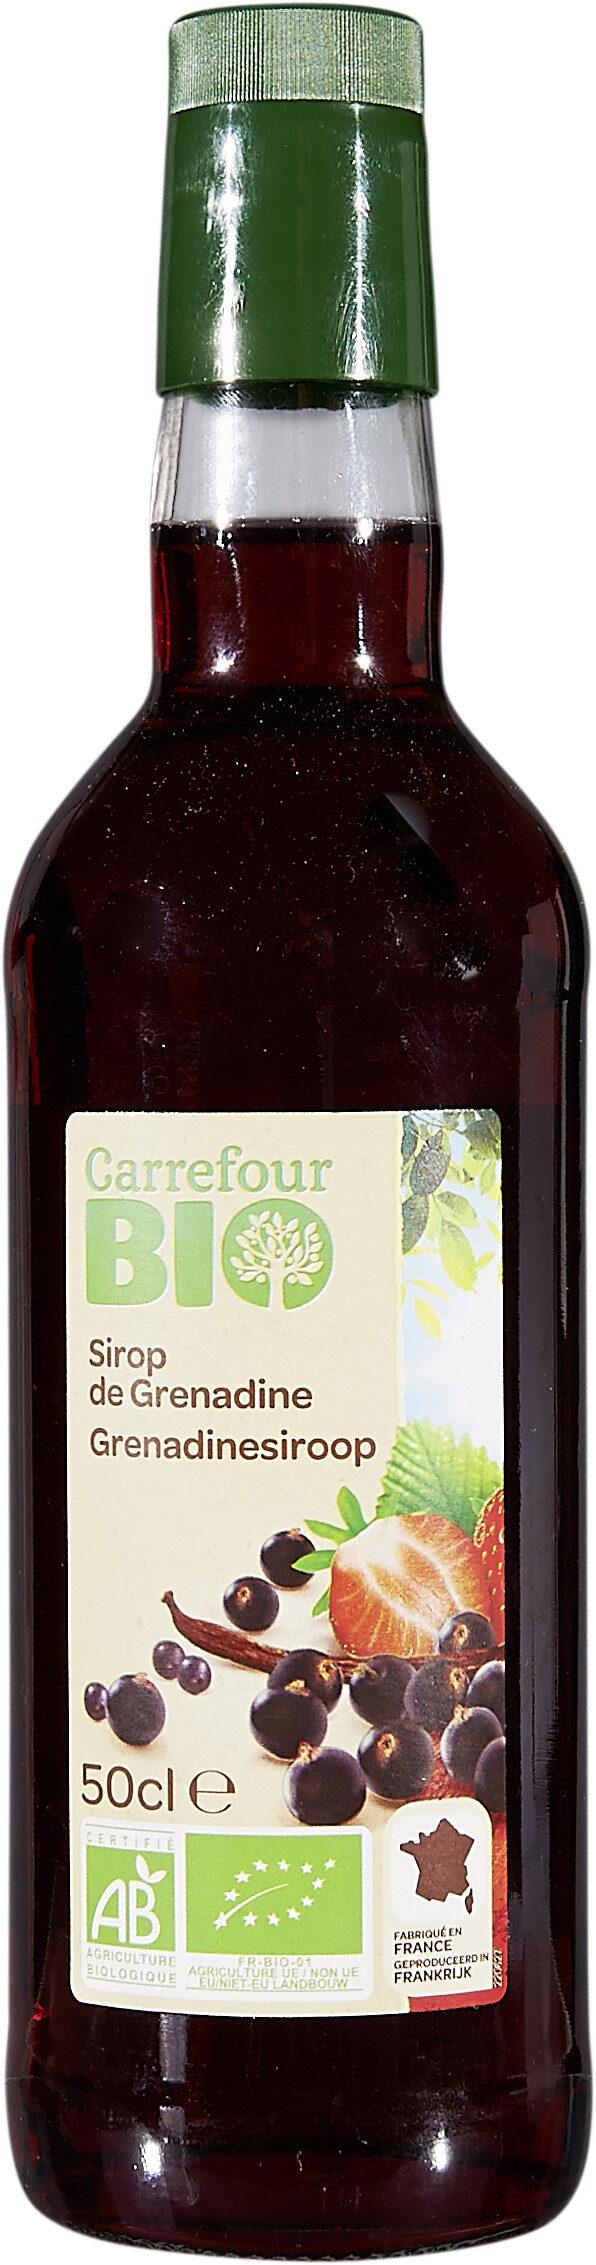 Sirop de grenadine - Produit - fr